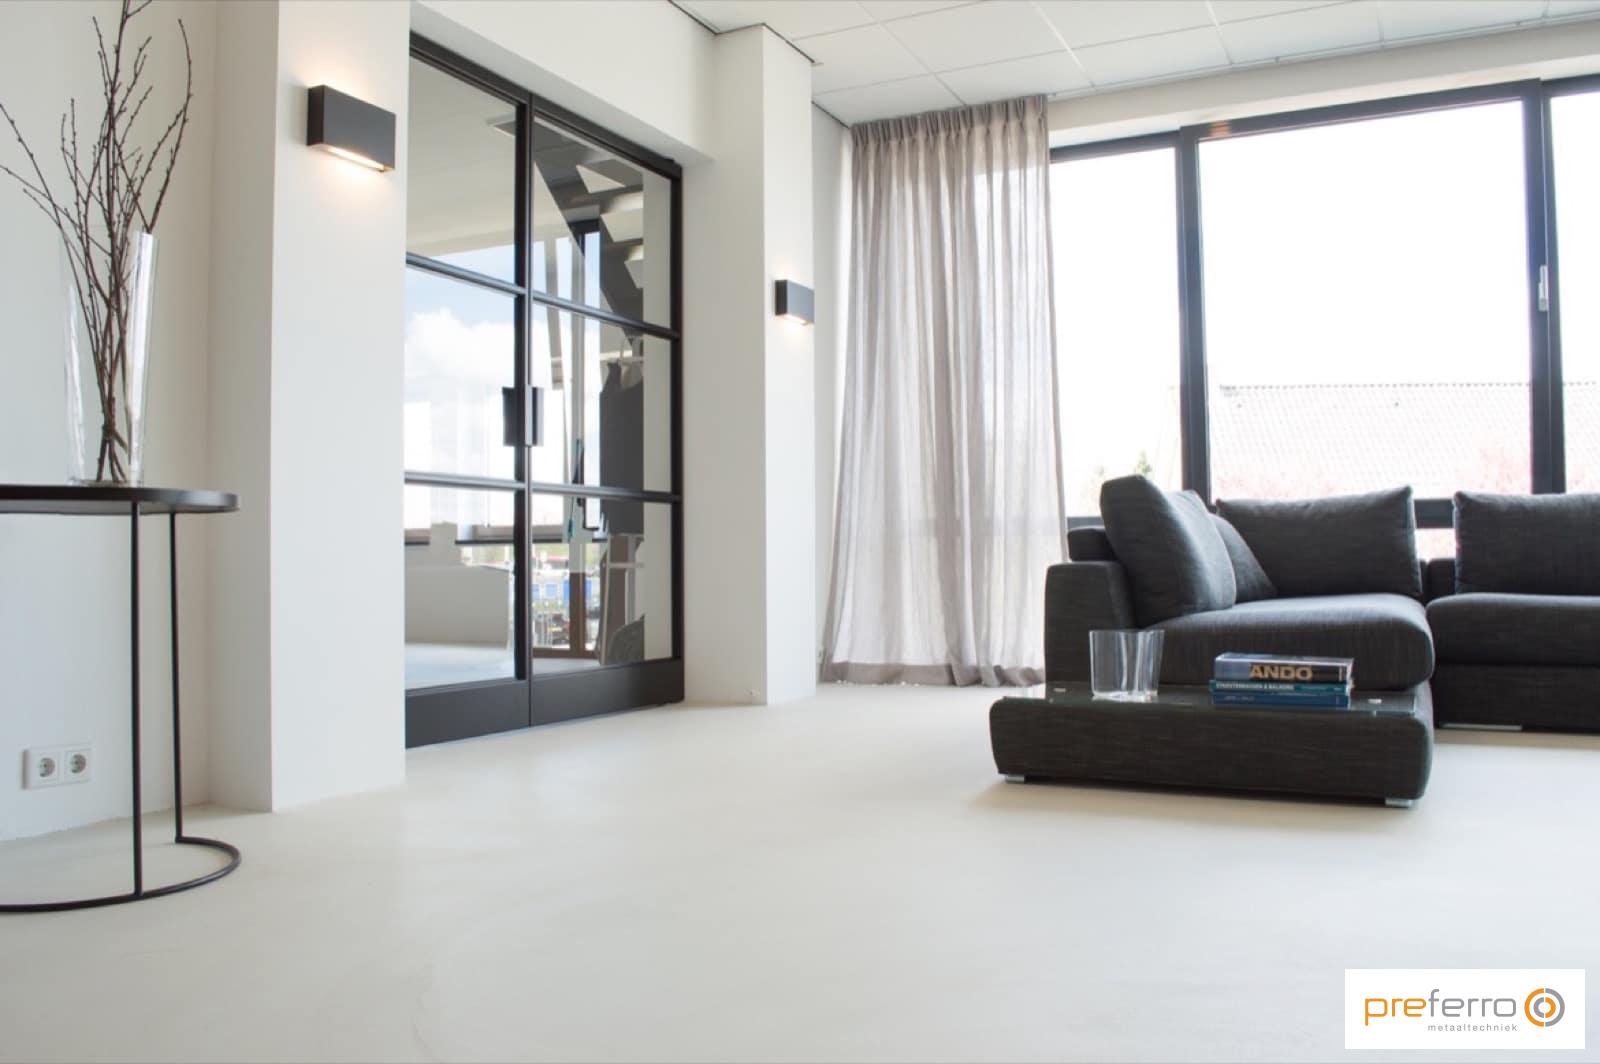 Dubbele binnendeuren met glas in woonkamer | Deuren | Pinterest